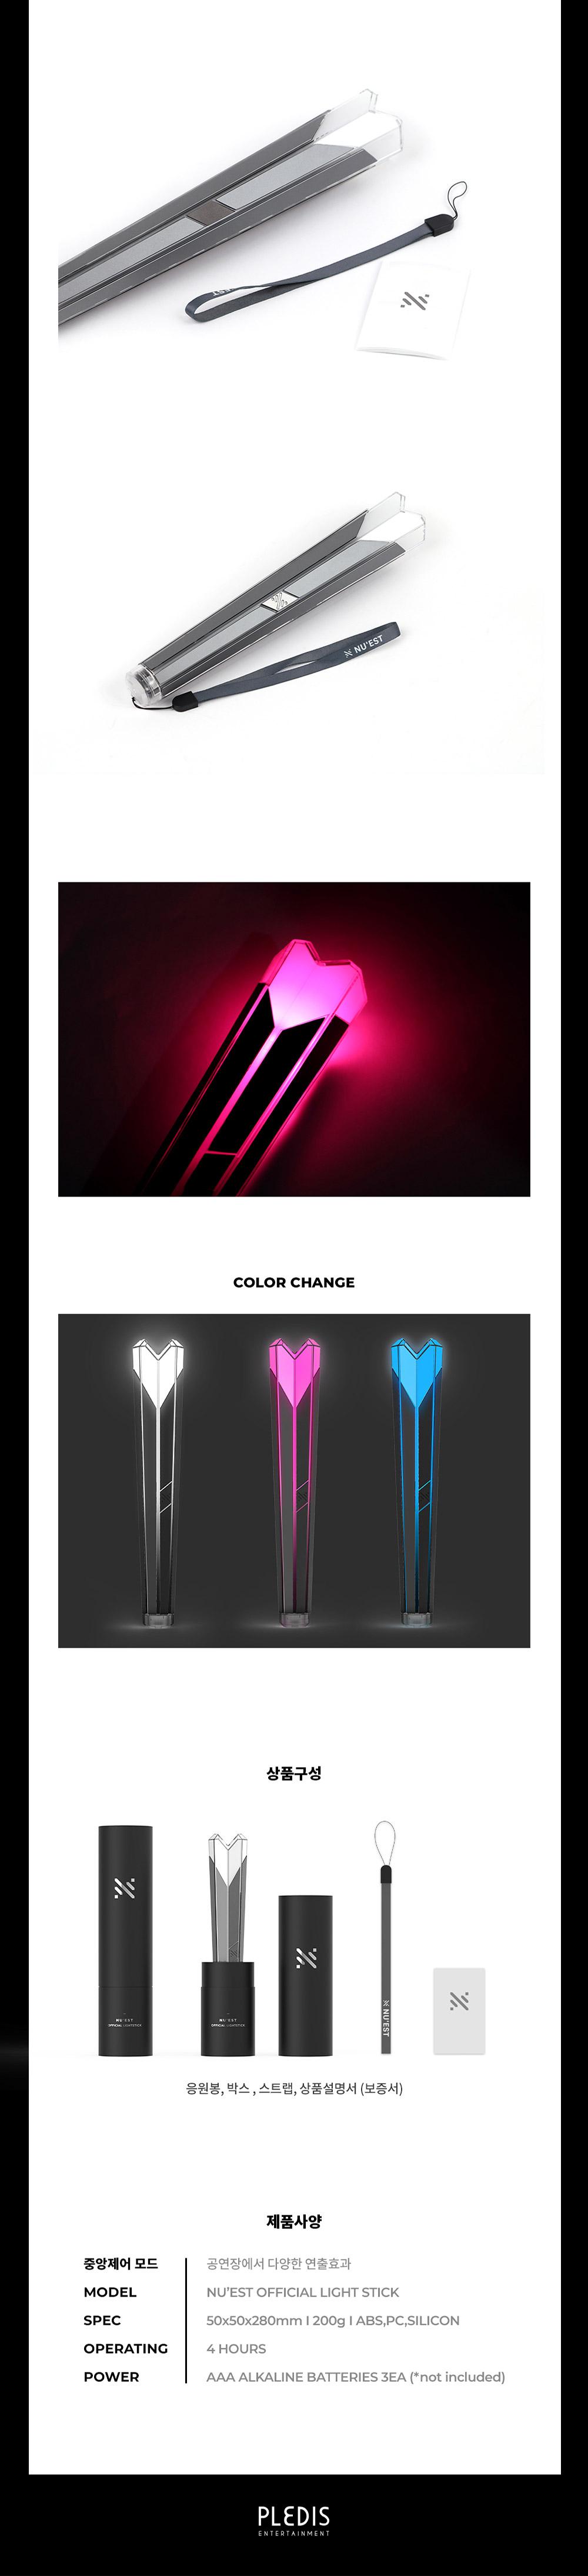 Kết quả hình ảnh cho NU'EST - Official Lightstick